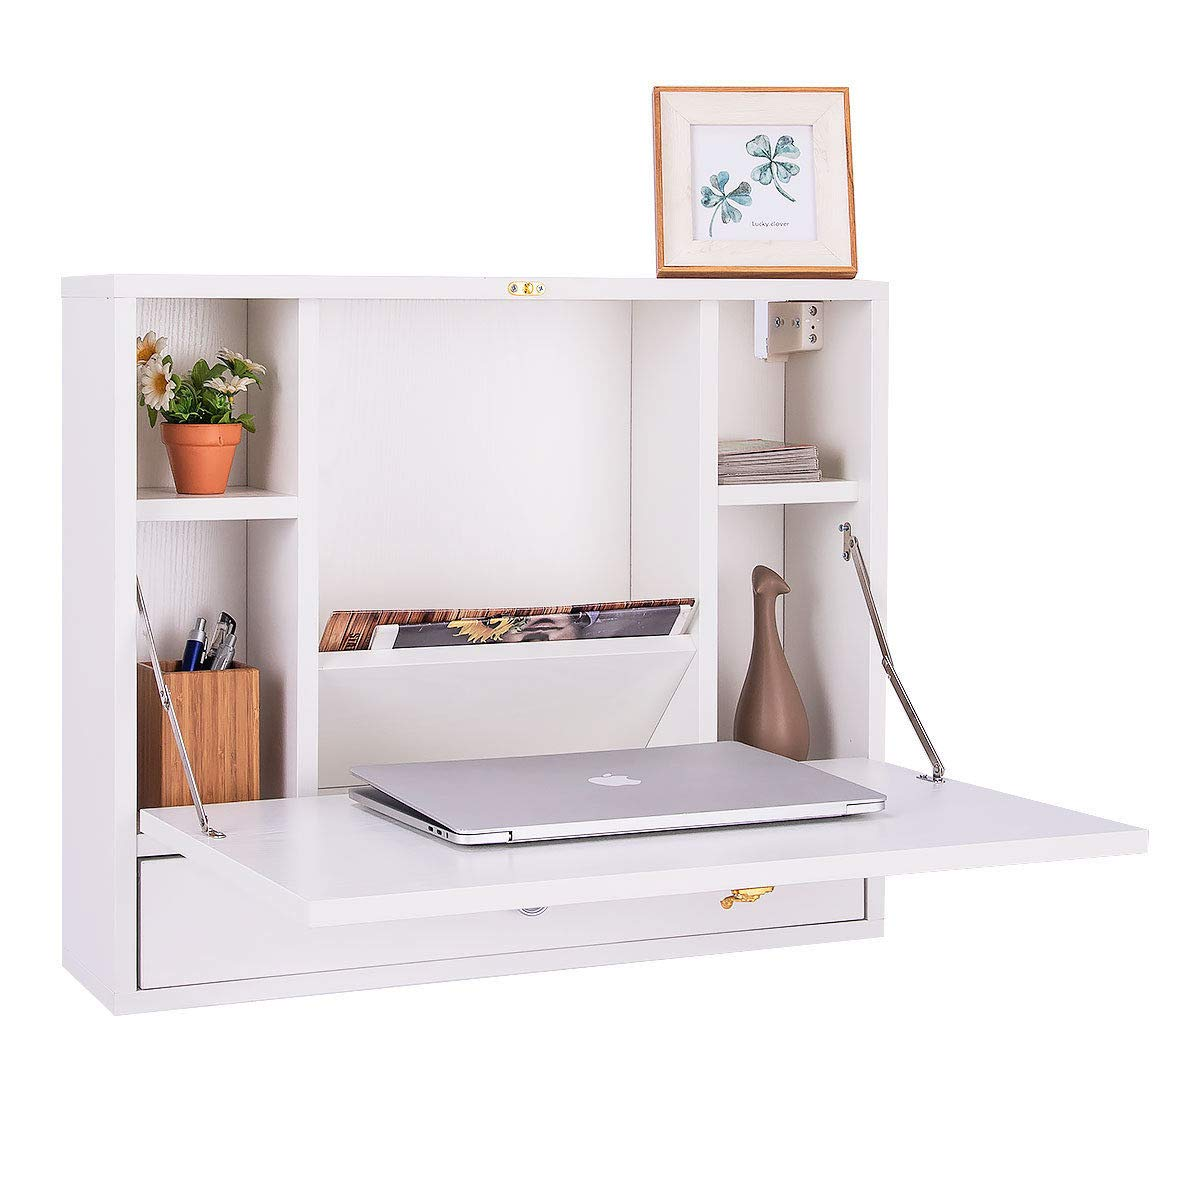 COSTWAYUS VD-60360WHHW COSTWAY Wall Mounted Folding Laptop Desk Hideaway Organizer Storage Space Saver w/Drawer White